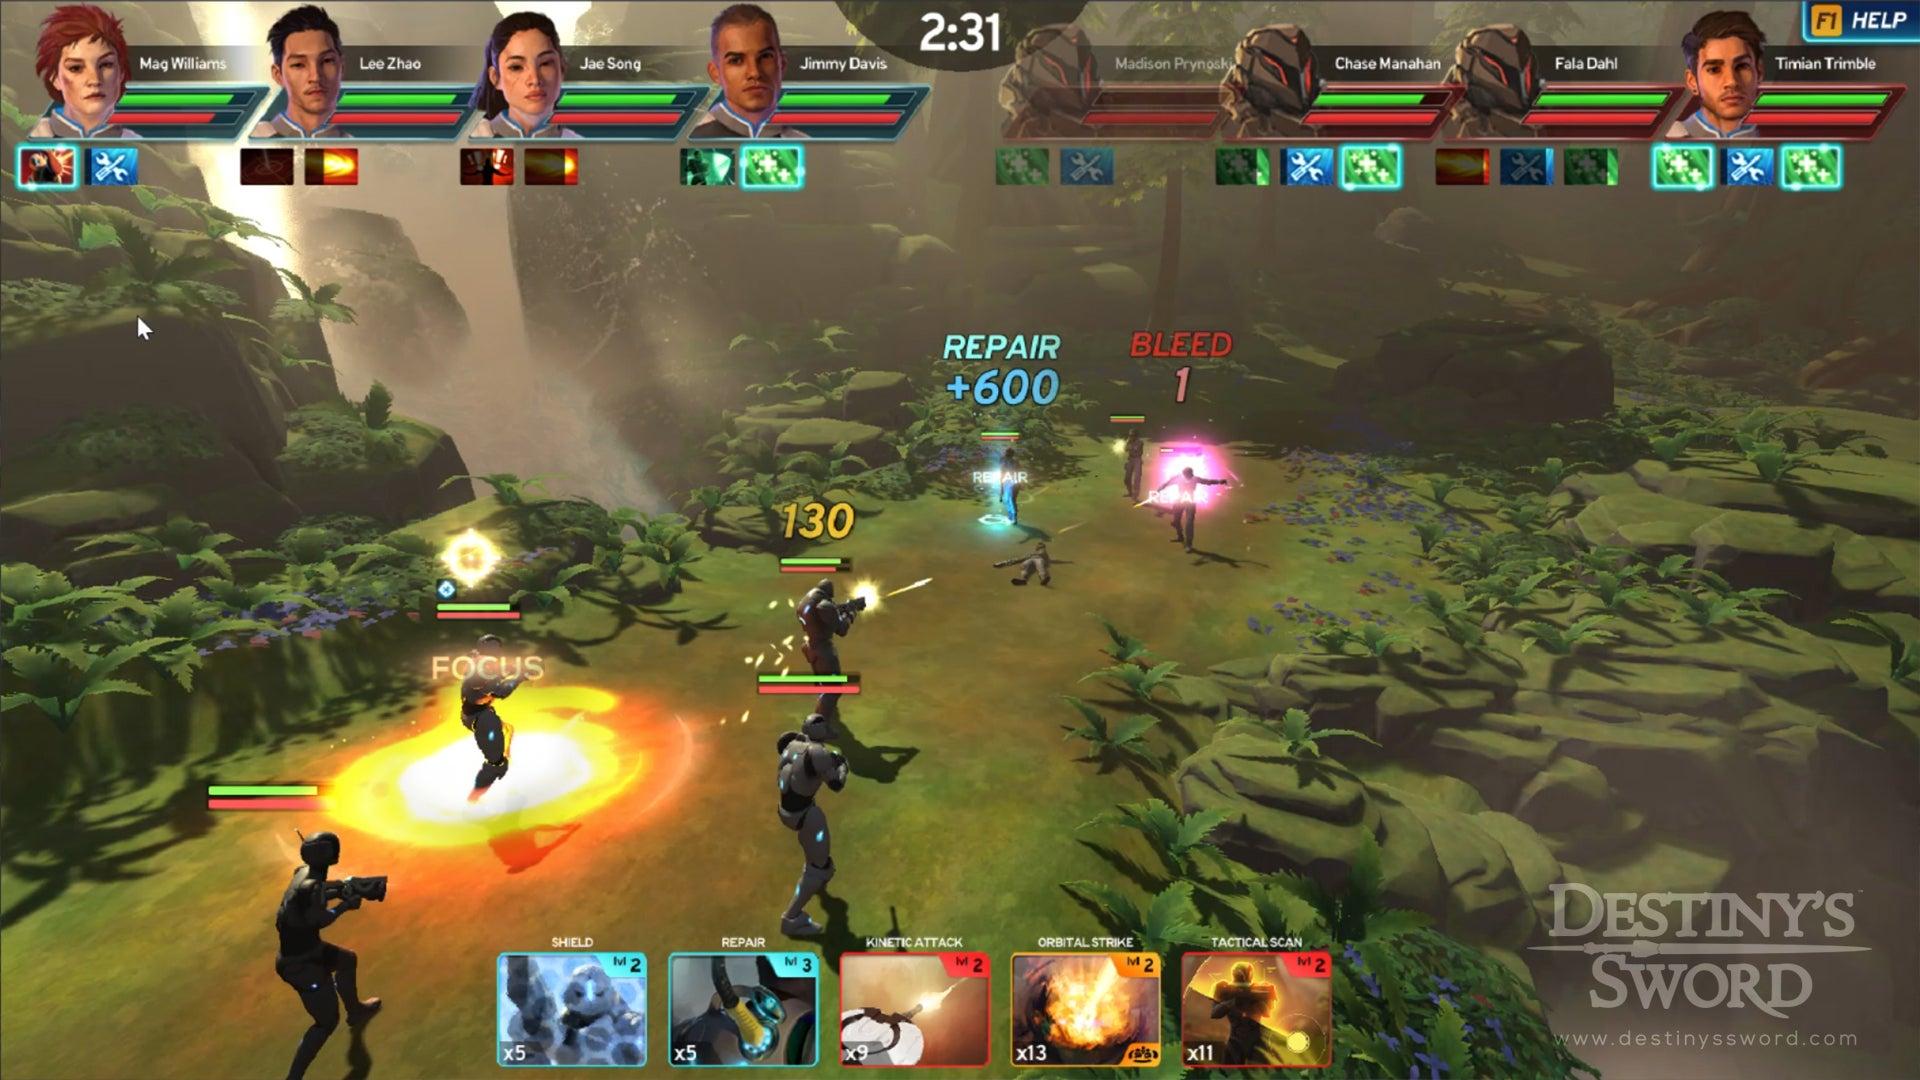 Screenshot of Destiny's Sword